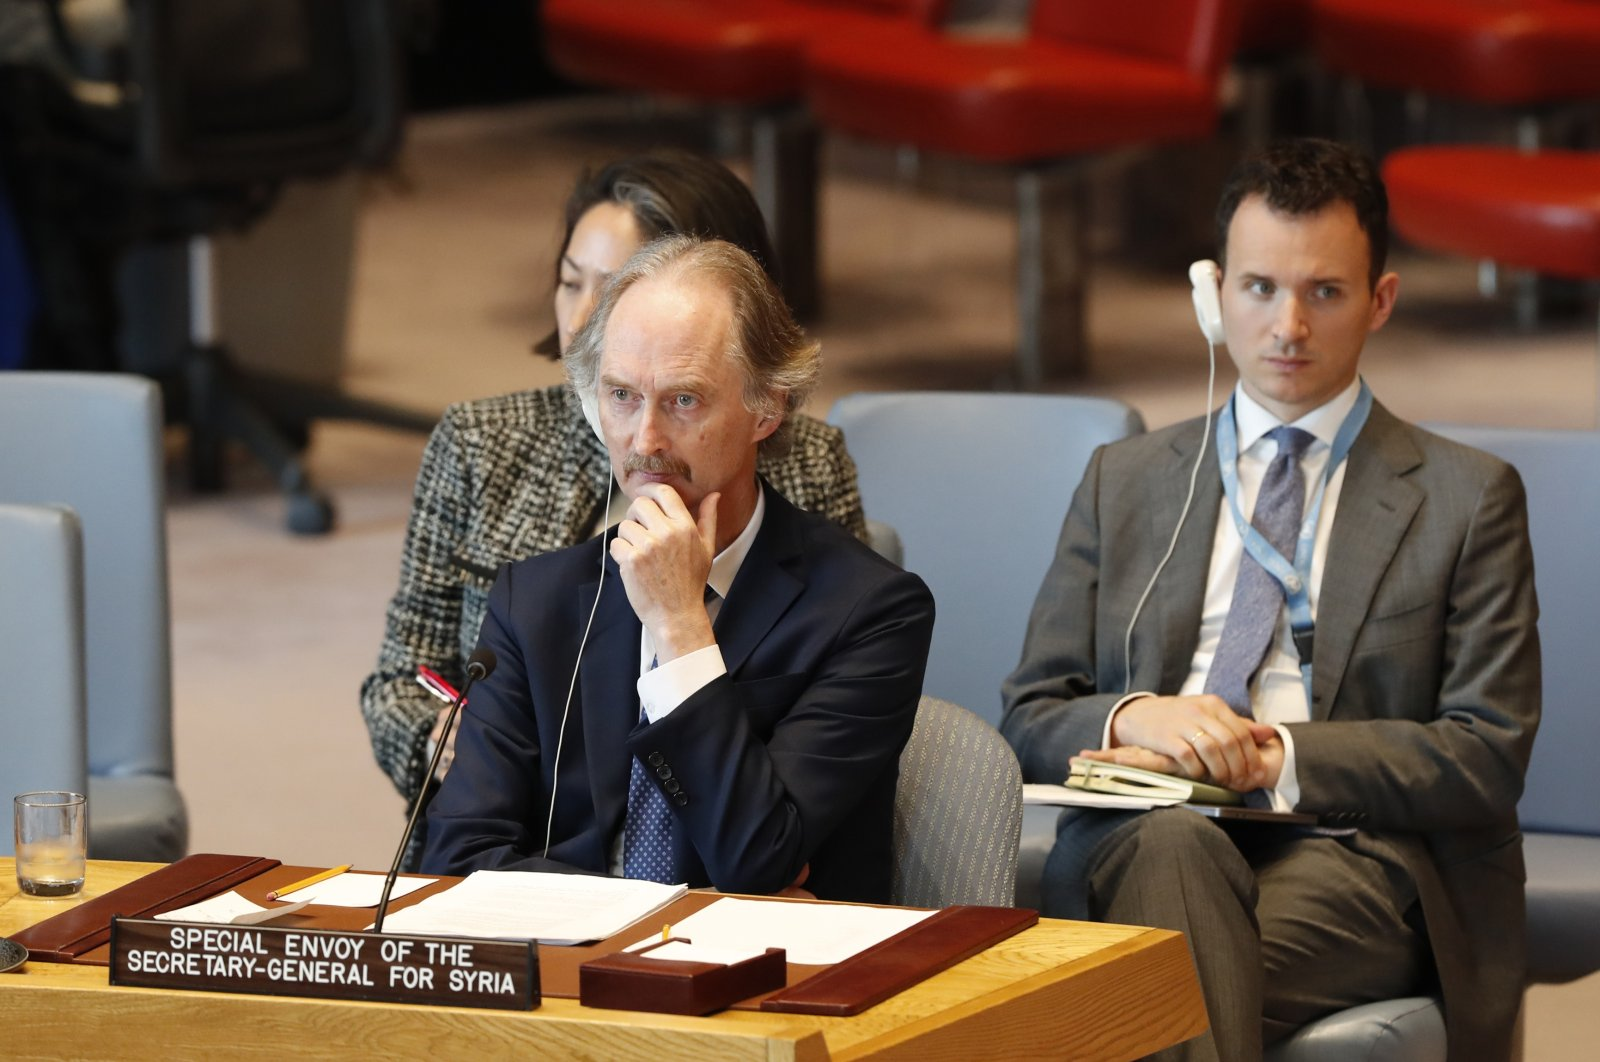 Talks on Syria's constitution to resume next week, UN envoy says